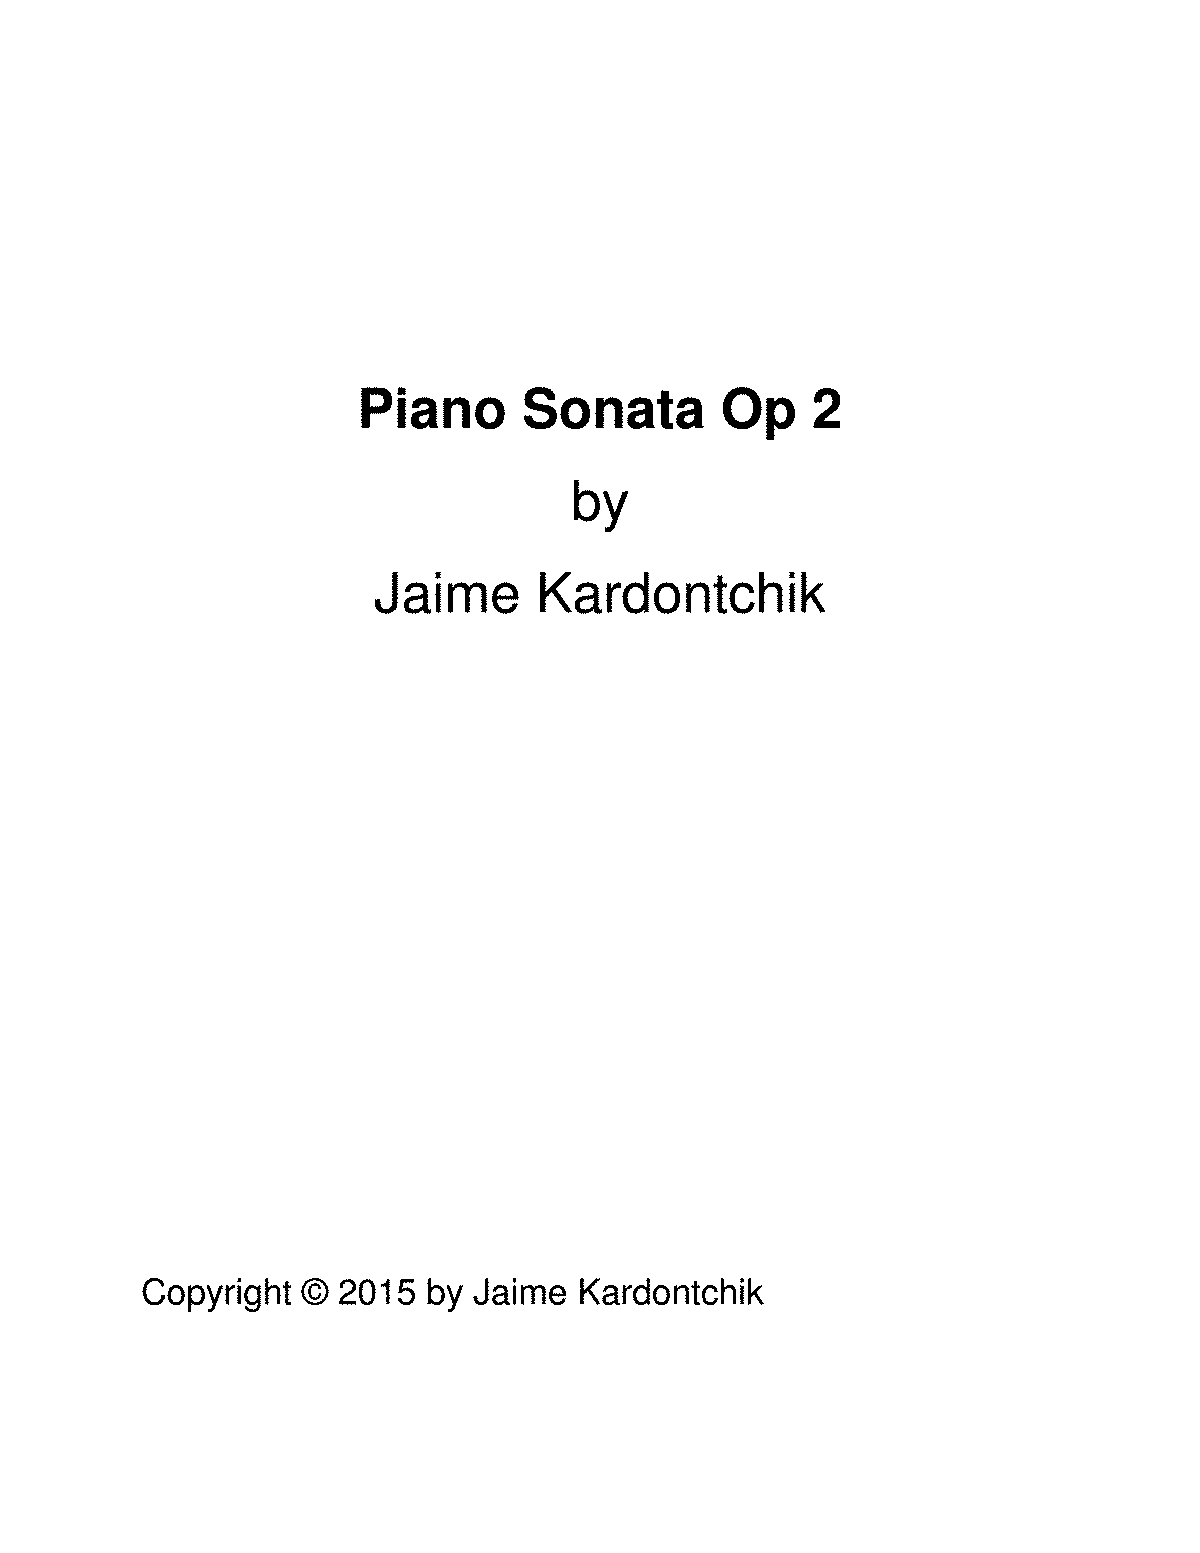 piano sonata op kardontchik jaime enrique petrucci  general information